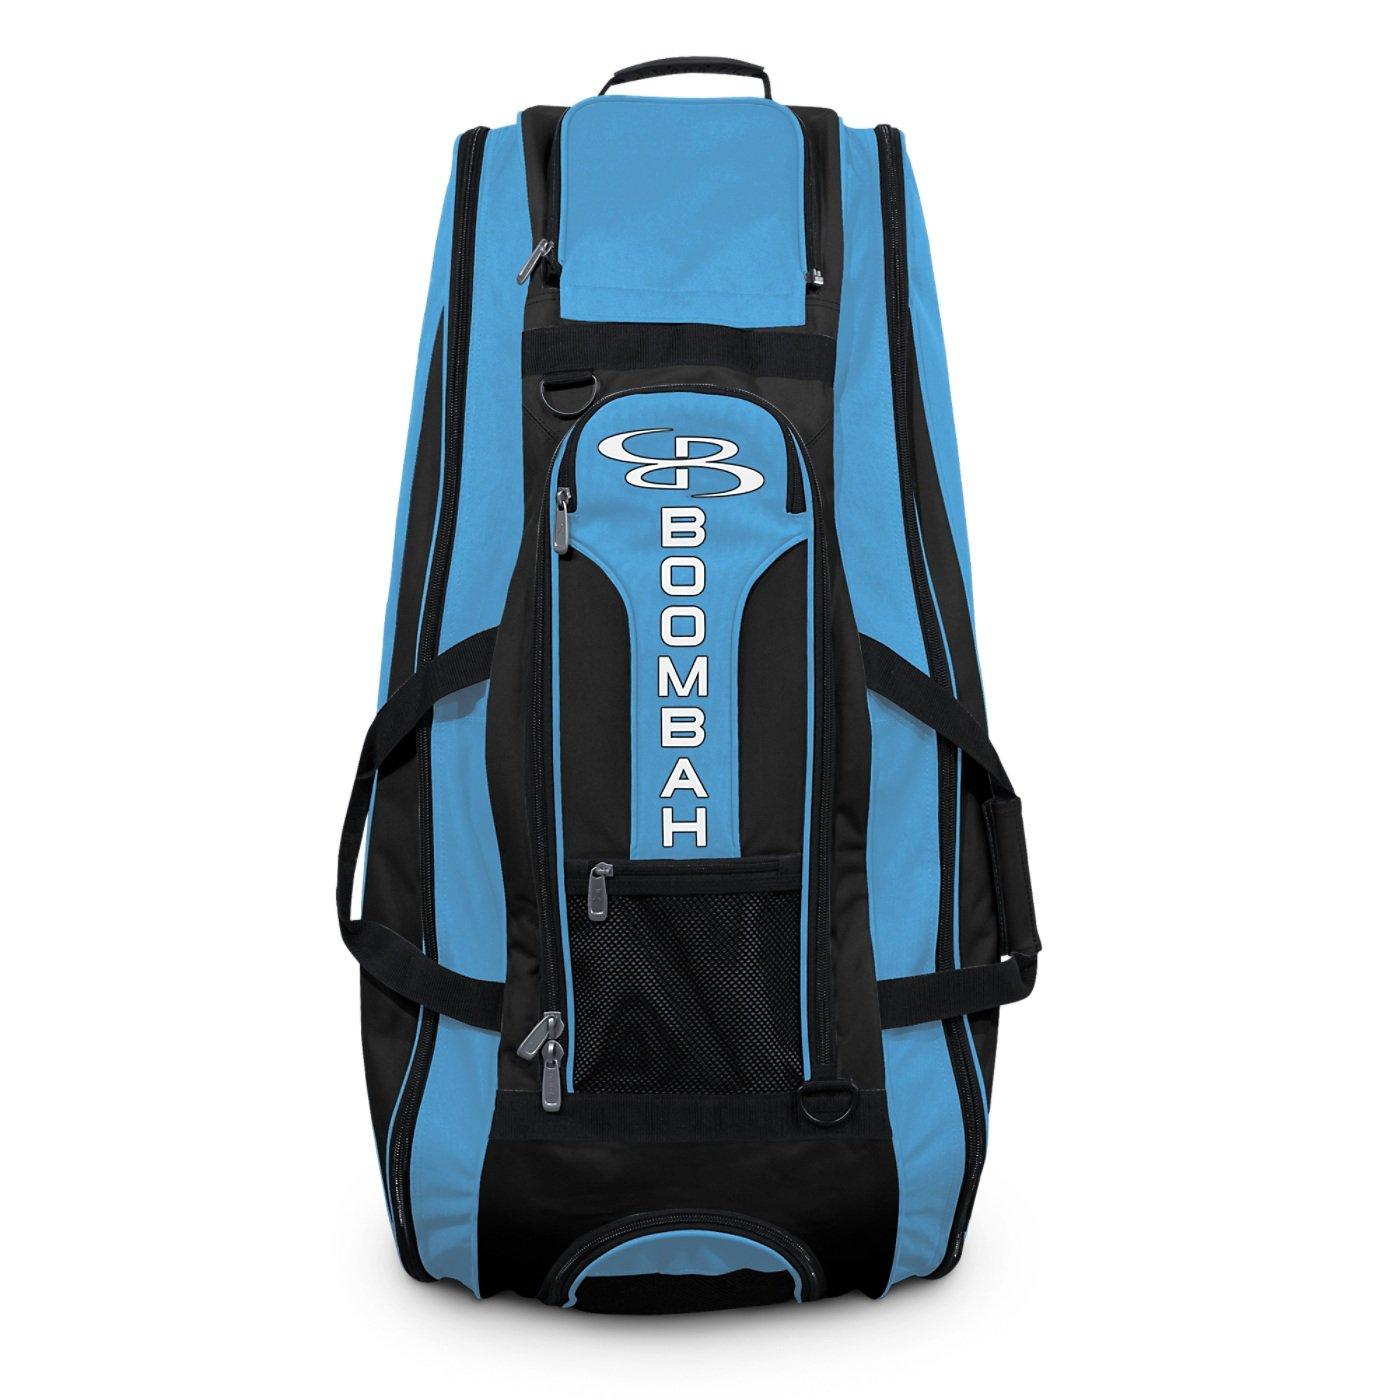 Boombah Beast Baseball/Softball Bat Bag - 40'' x 14'' x 13'' - Black/Columbia Blue - Holds 8 Bats, Glove & Shoe Compartments by Boombah (Image #3)